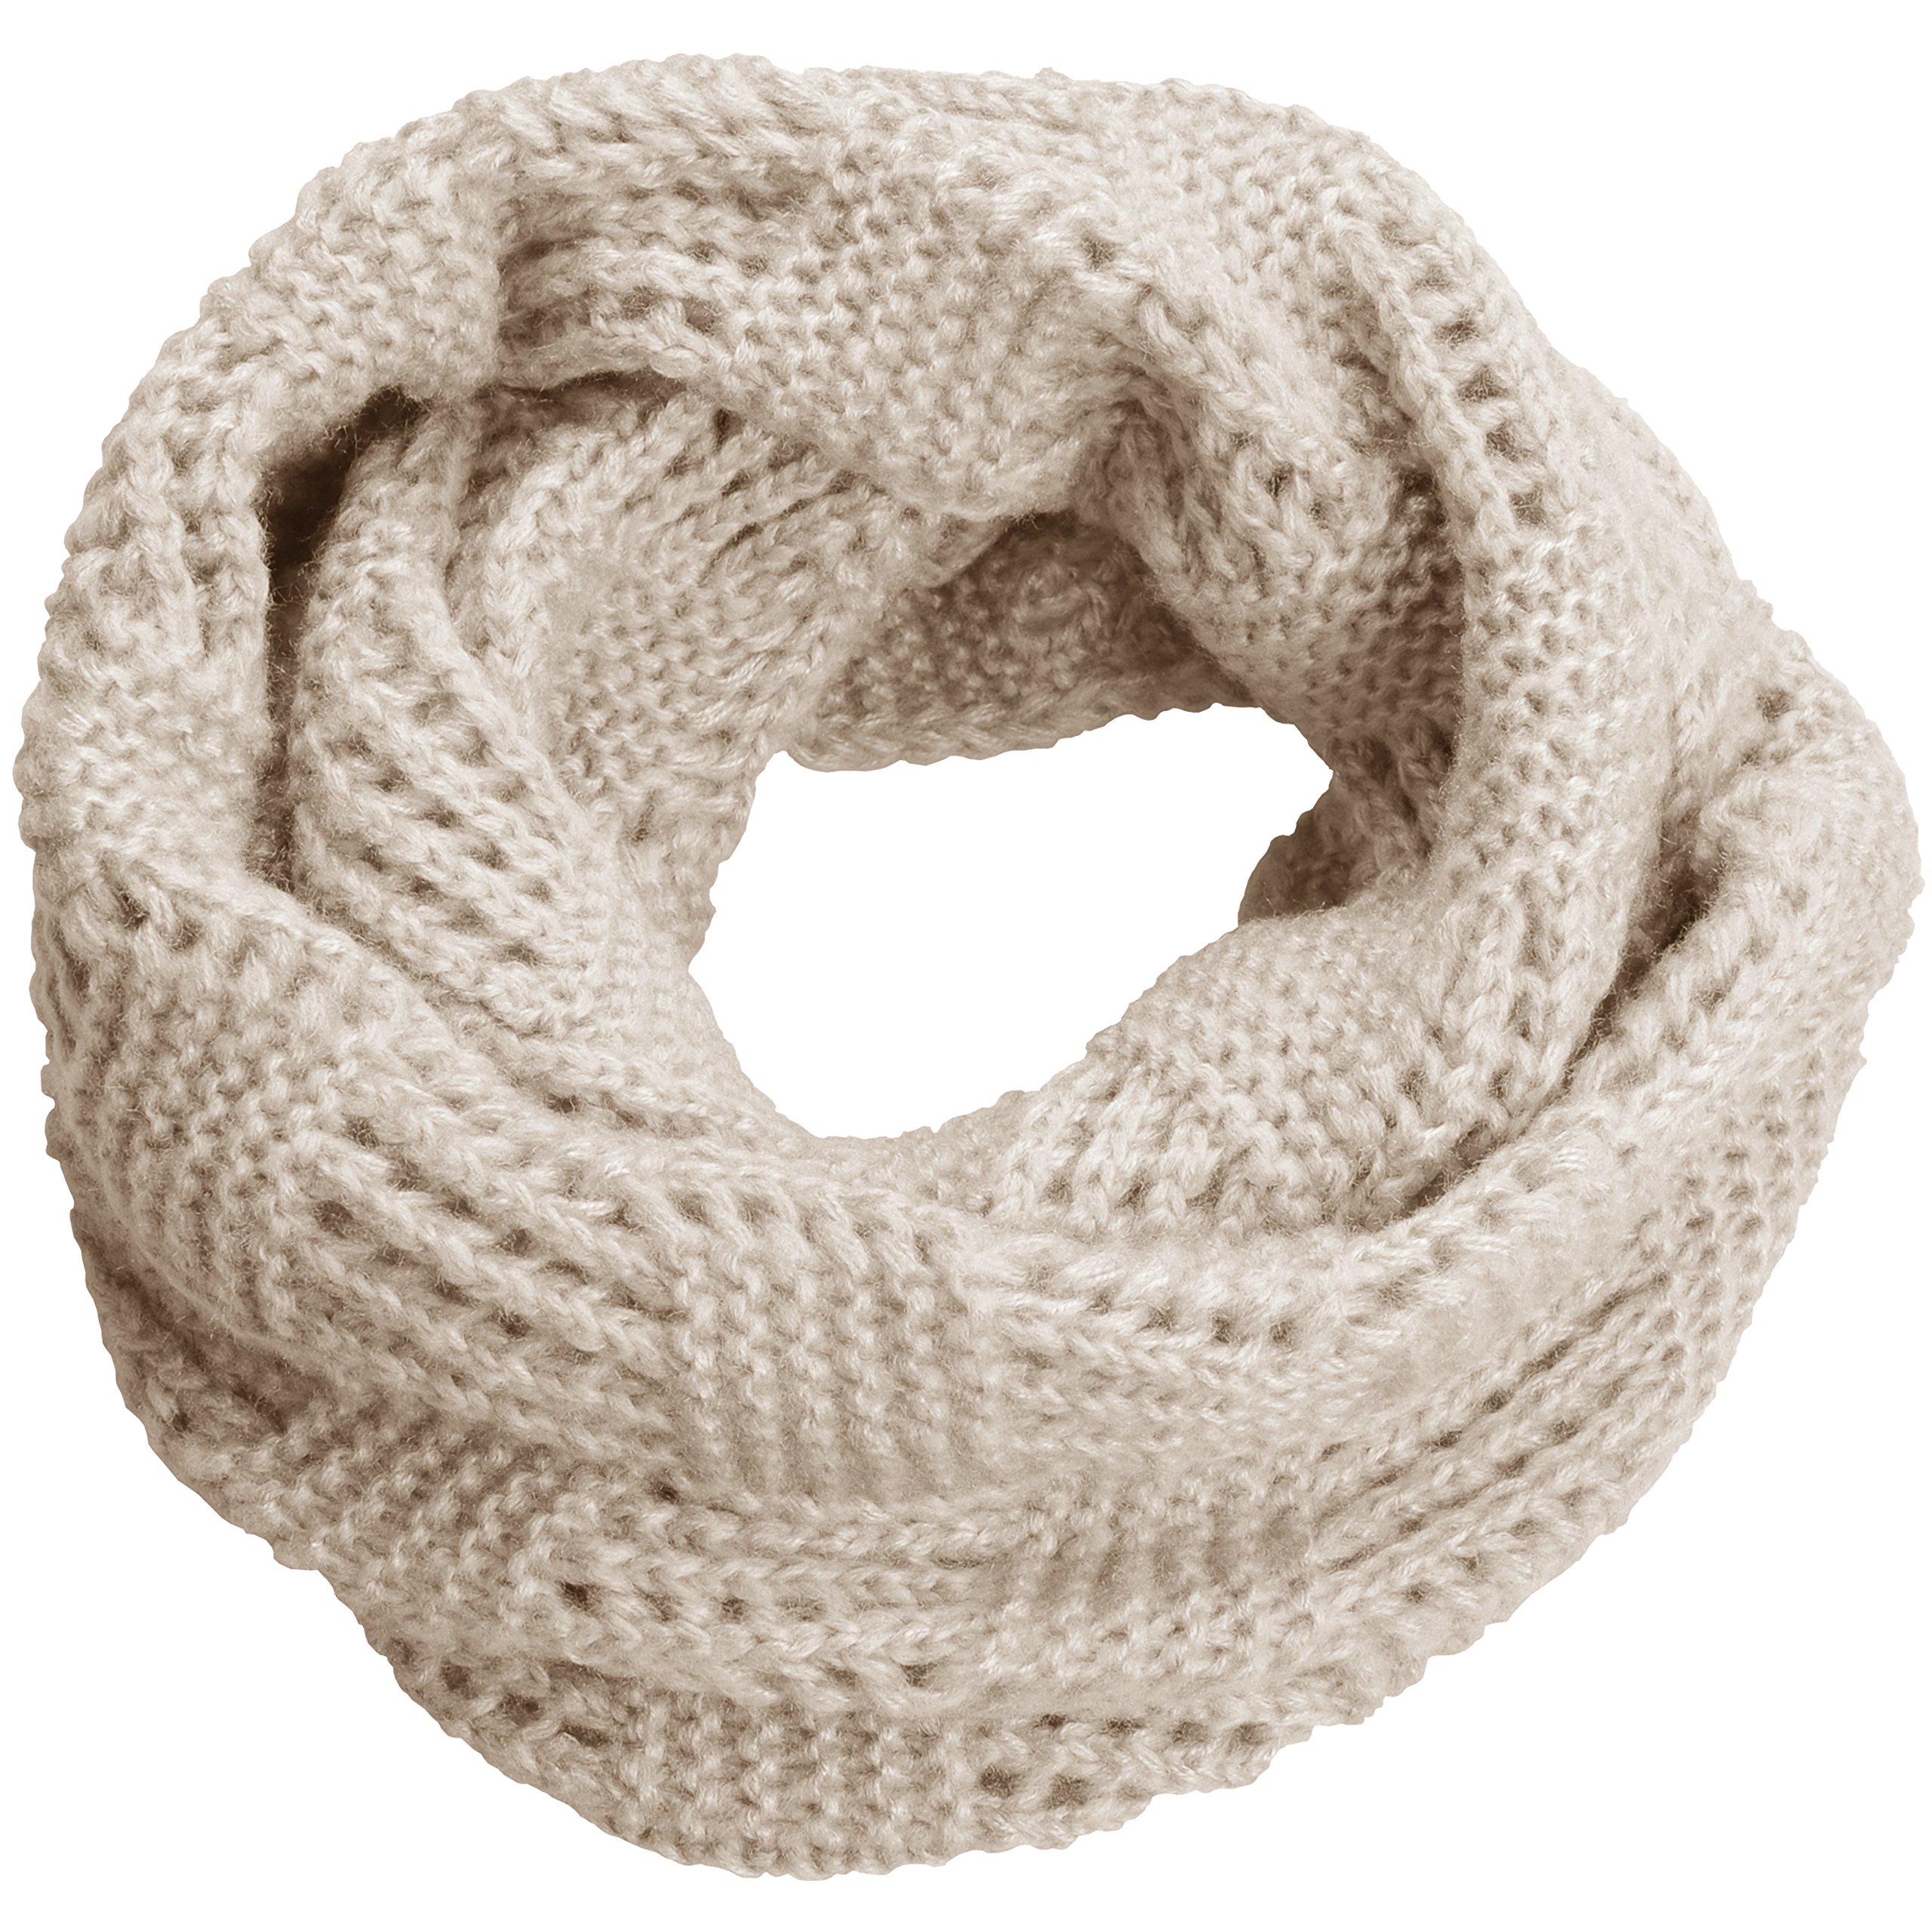 NEOSAN Women Warm Chunky Ribbed Knit Winter Infinity Loop Scarf Plaid Khaki by NEOSAN